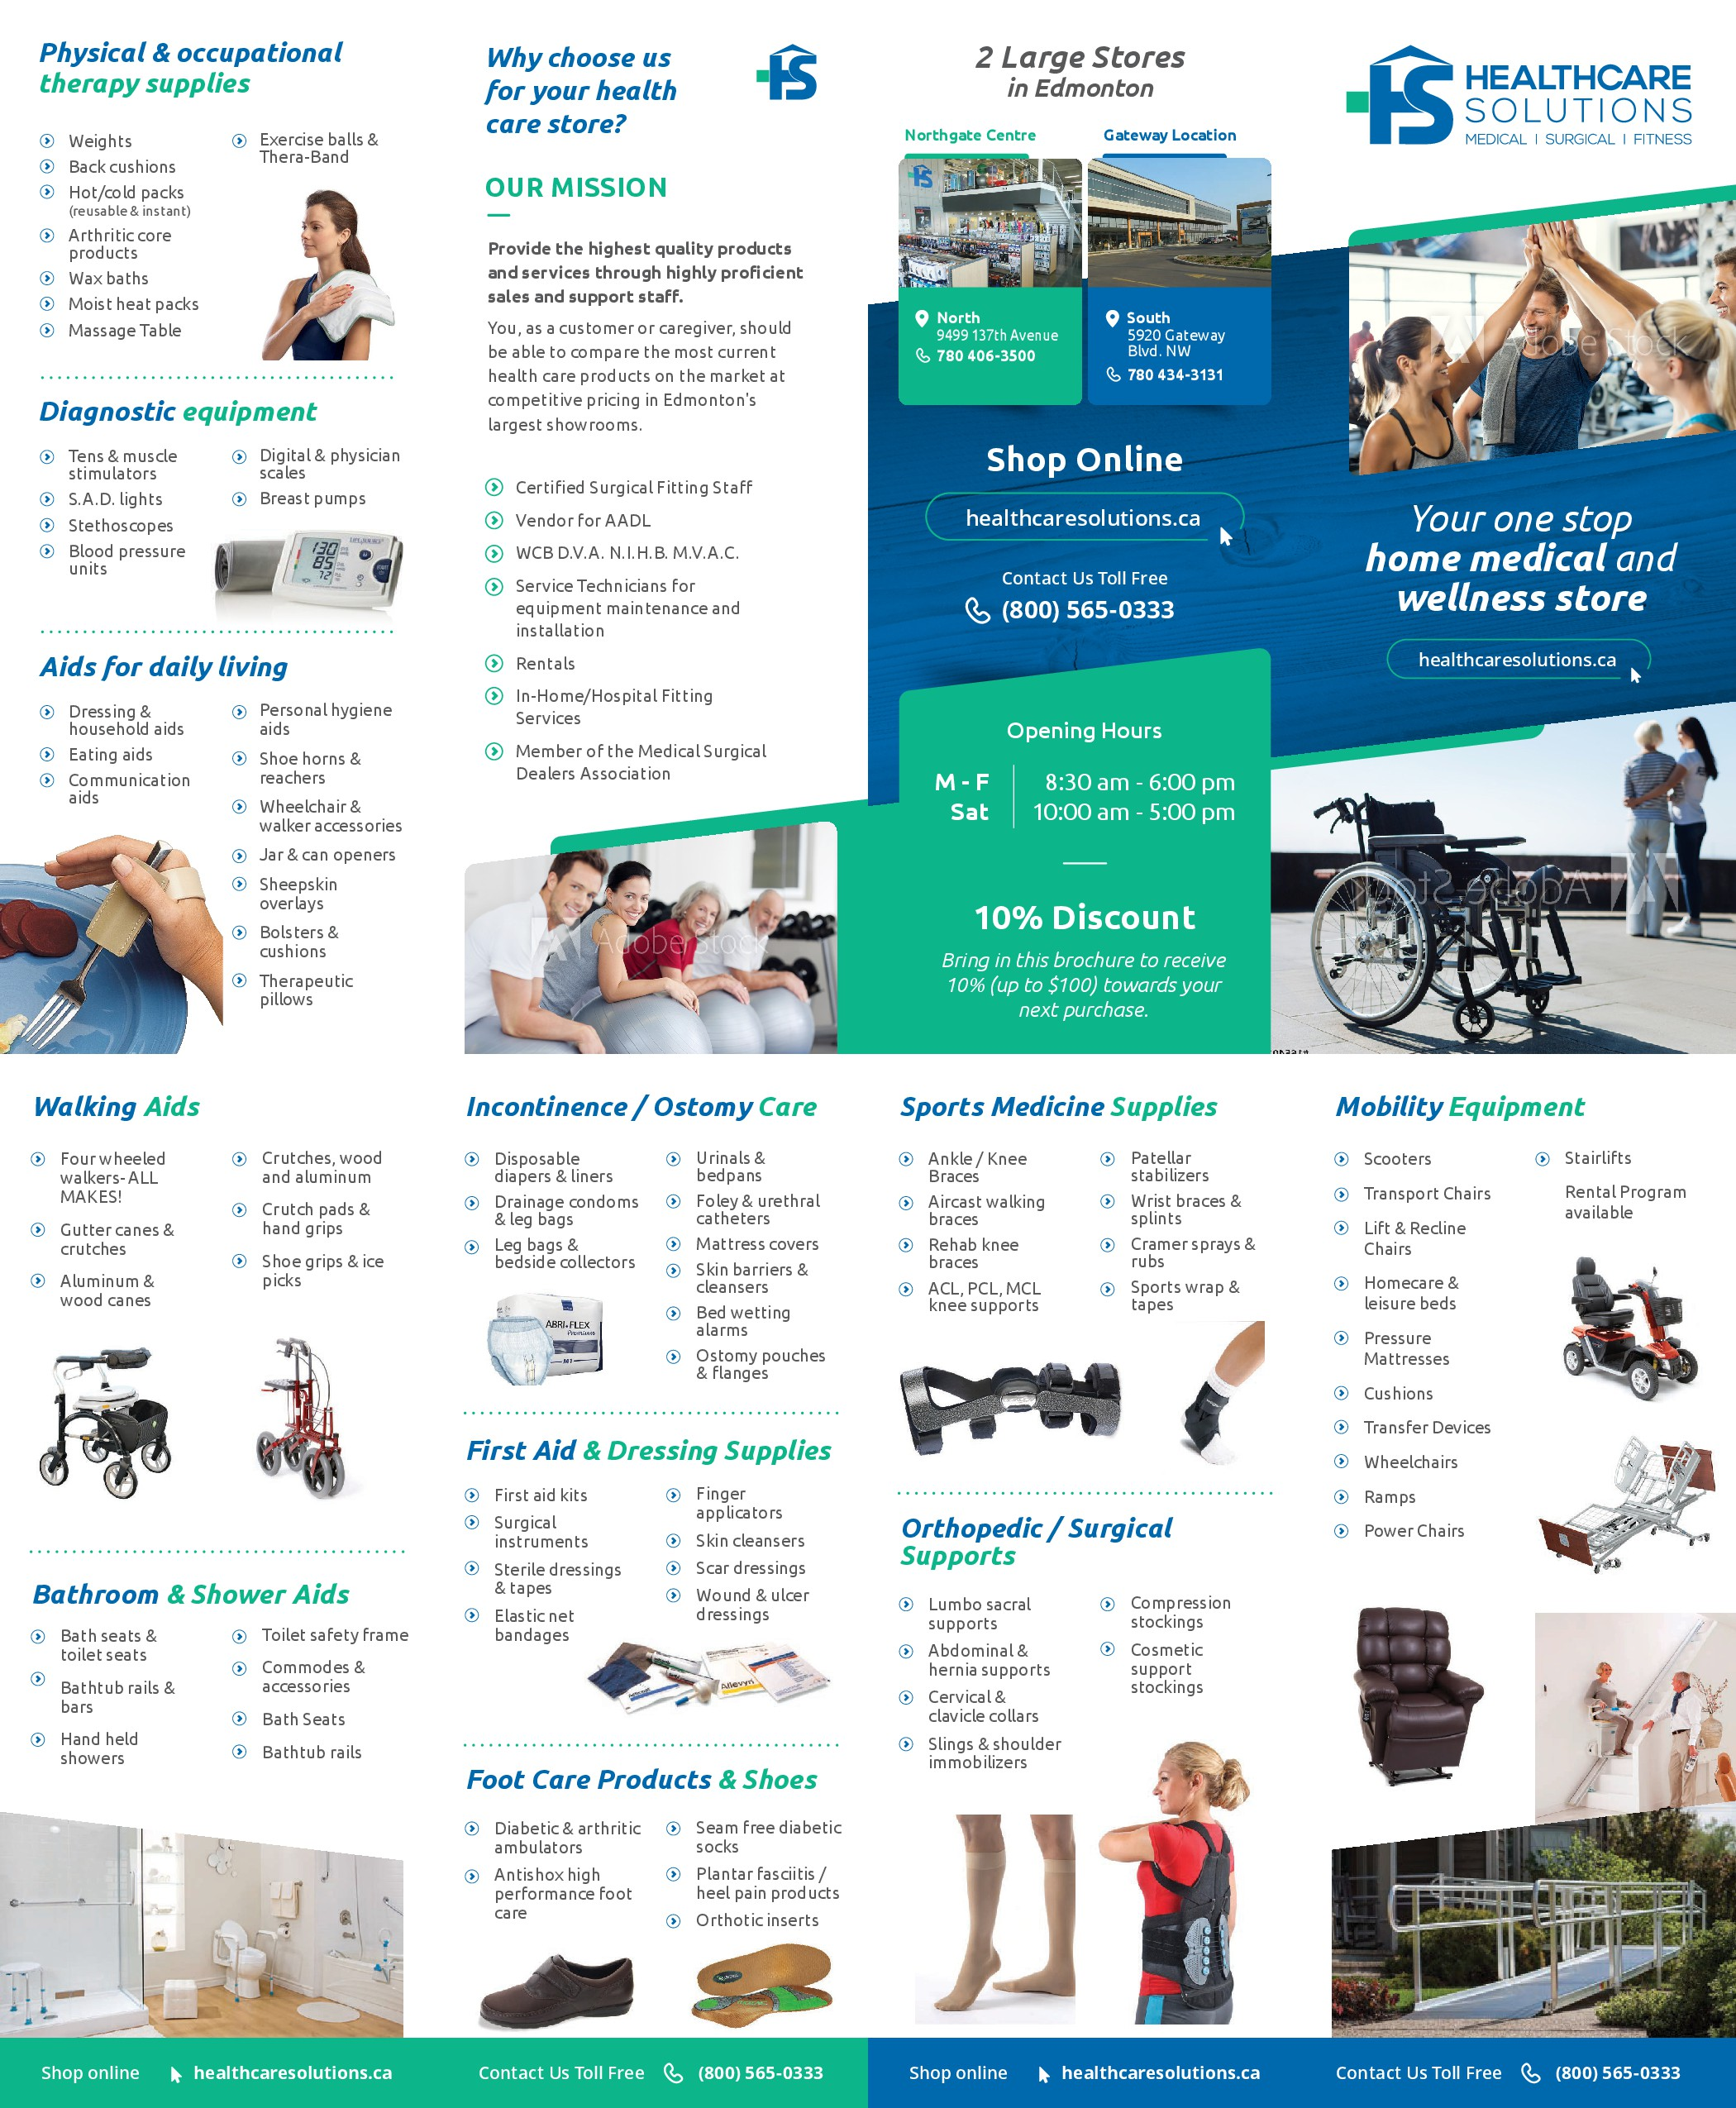 Healthcare Solutions - Design NEW Brochure